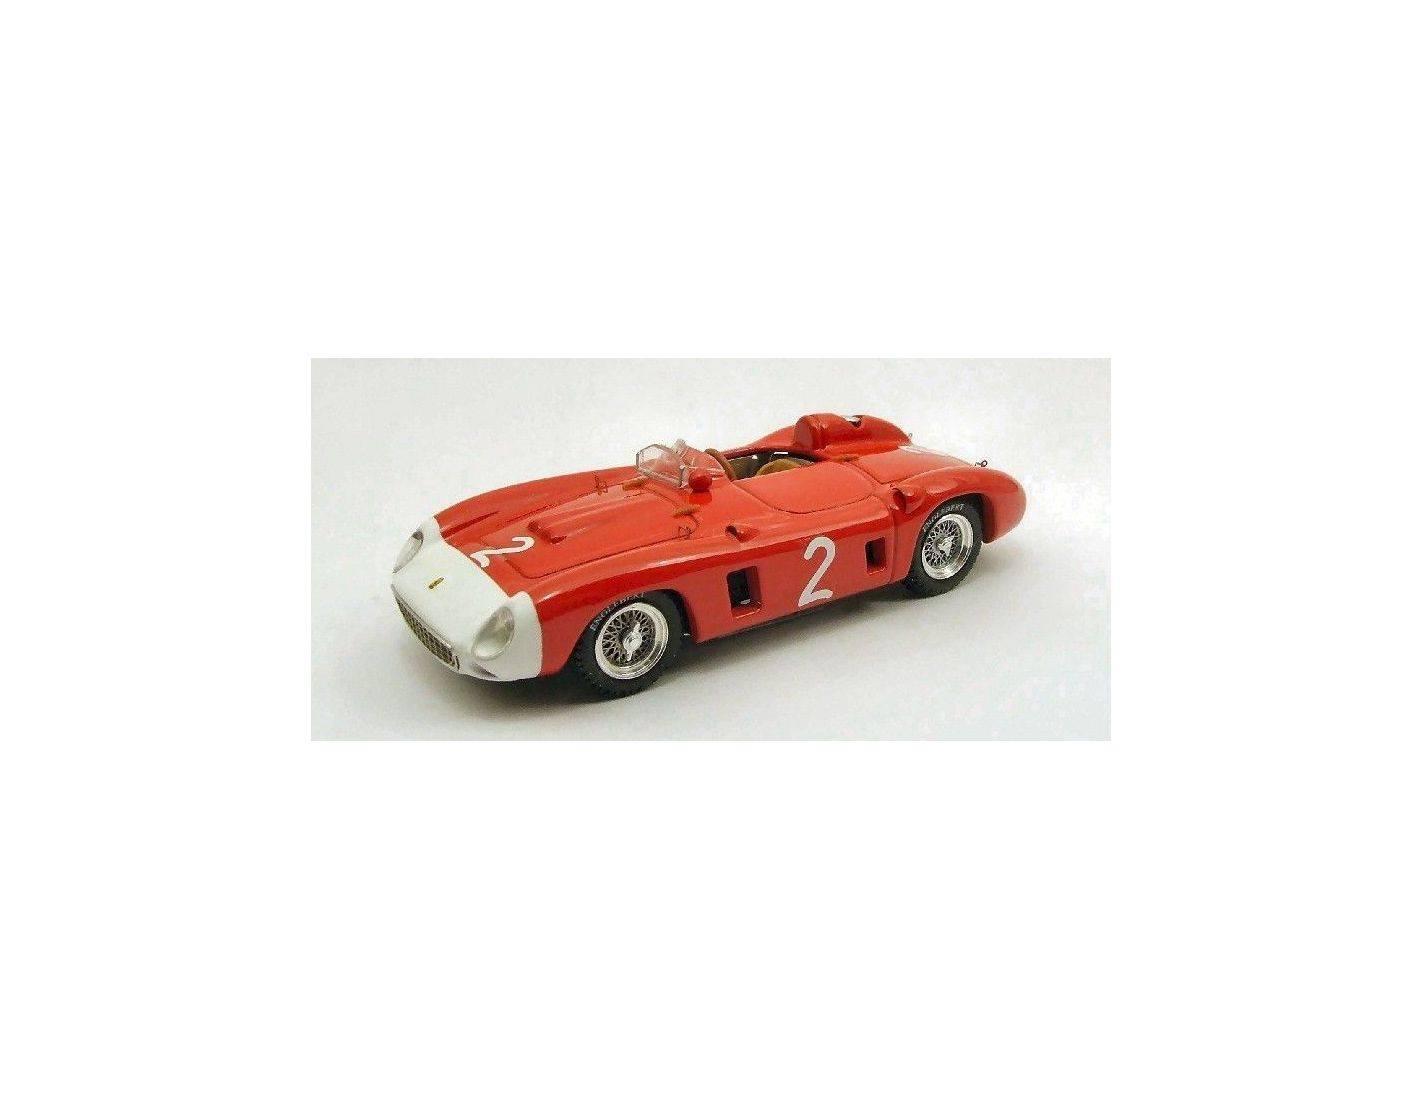 Art Model AM0228 FERRARI 860 MONZA N.2 WINNER GP ROUEN 1956 E.CASTELLOTTI  1:43 Modellino